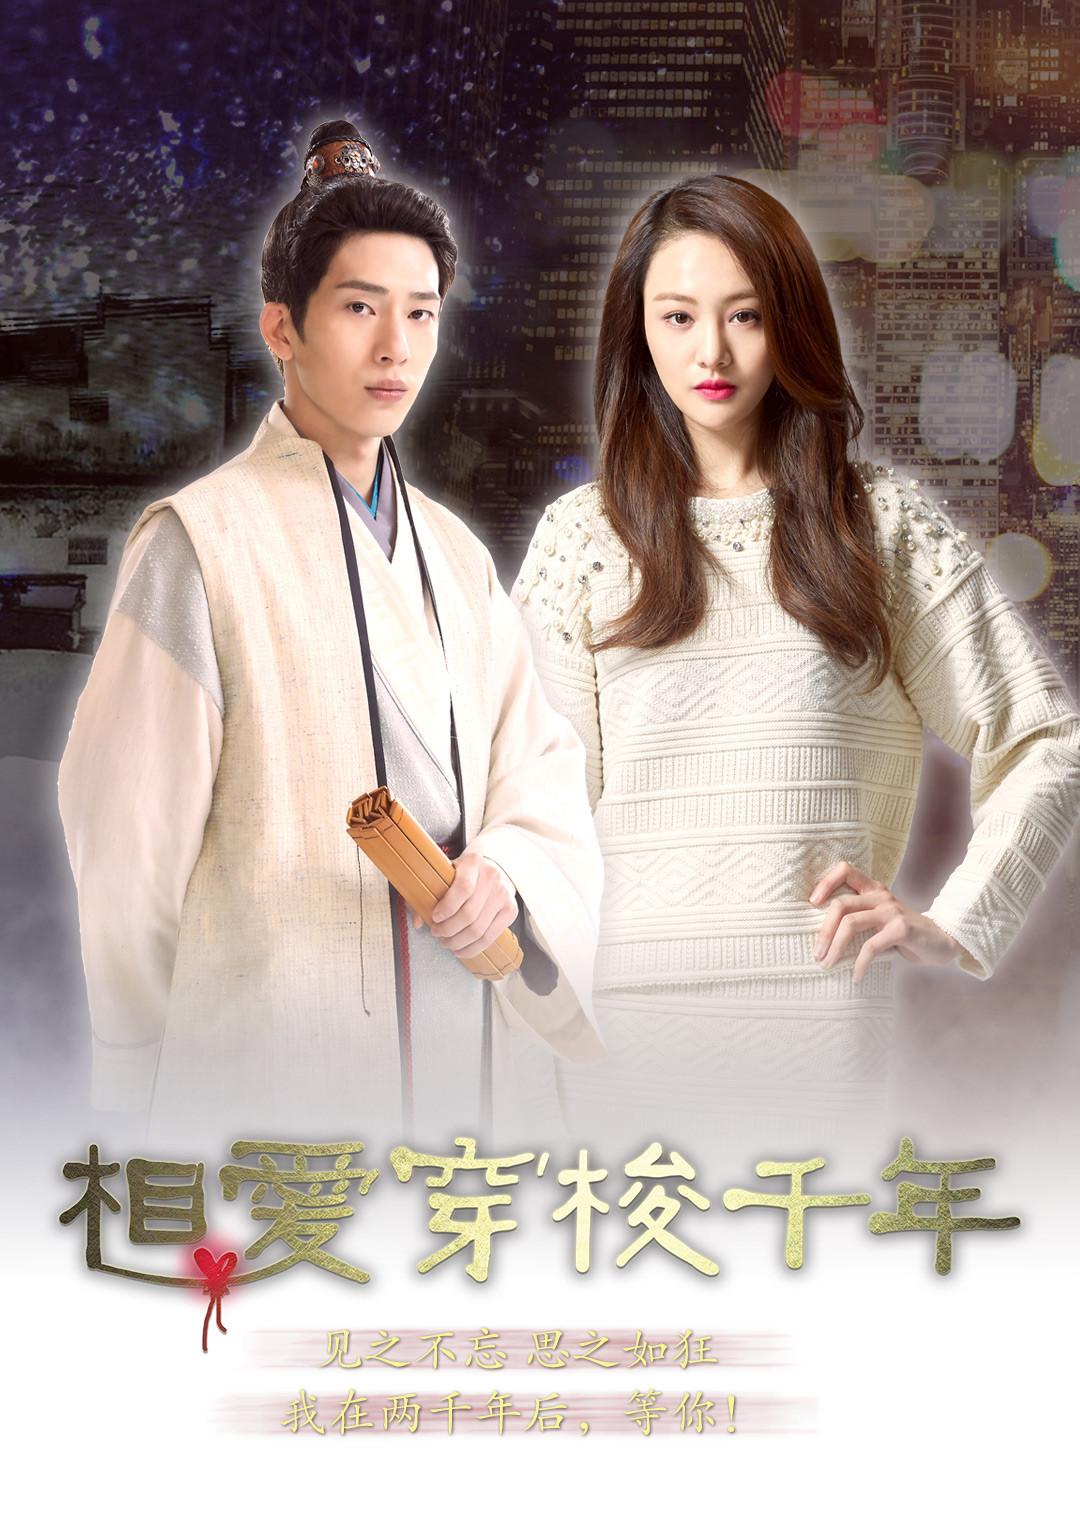 سریال چینی عشق هزار ساله